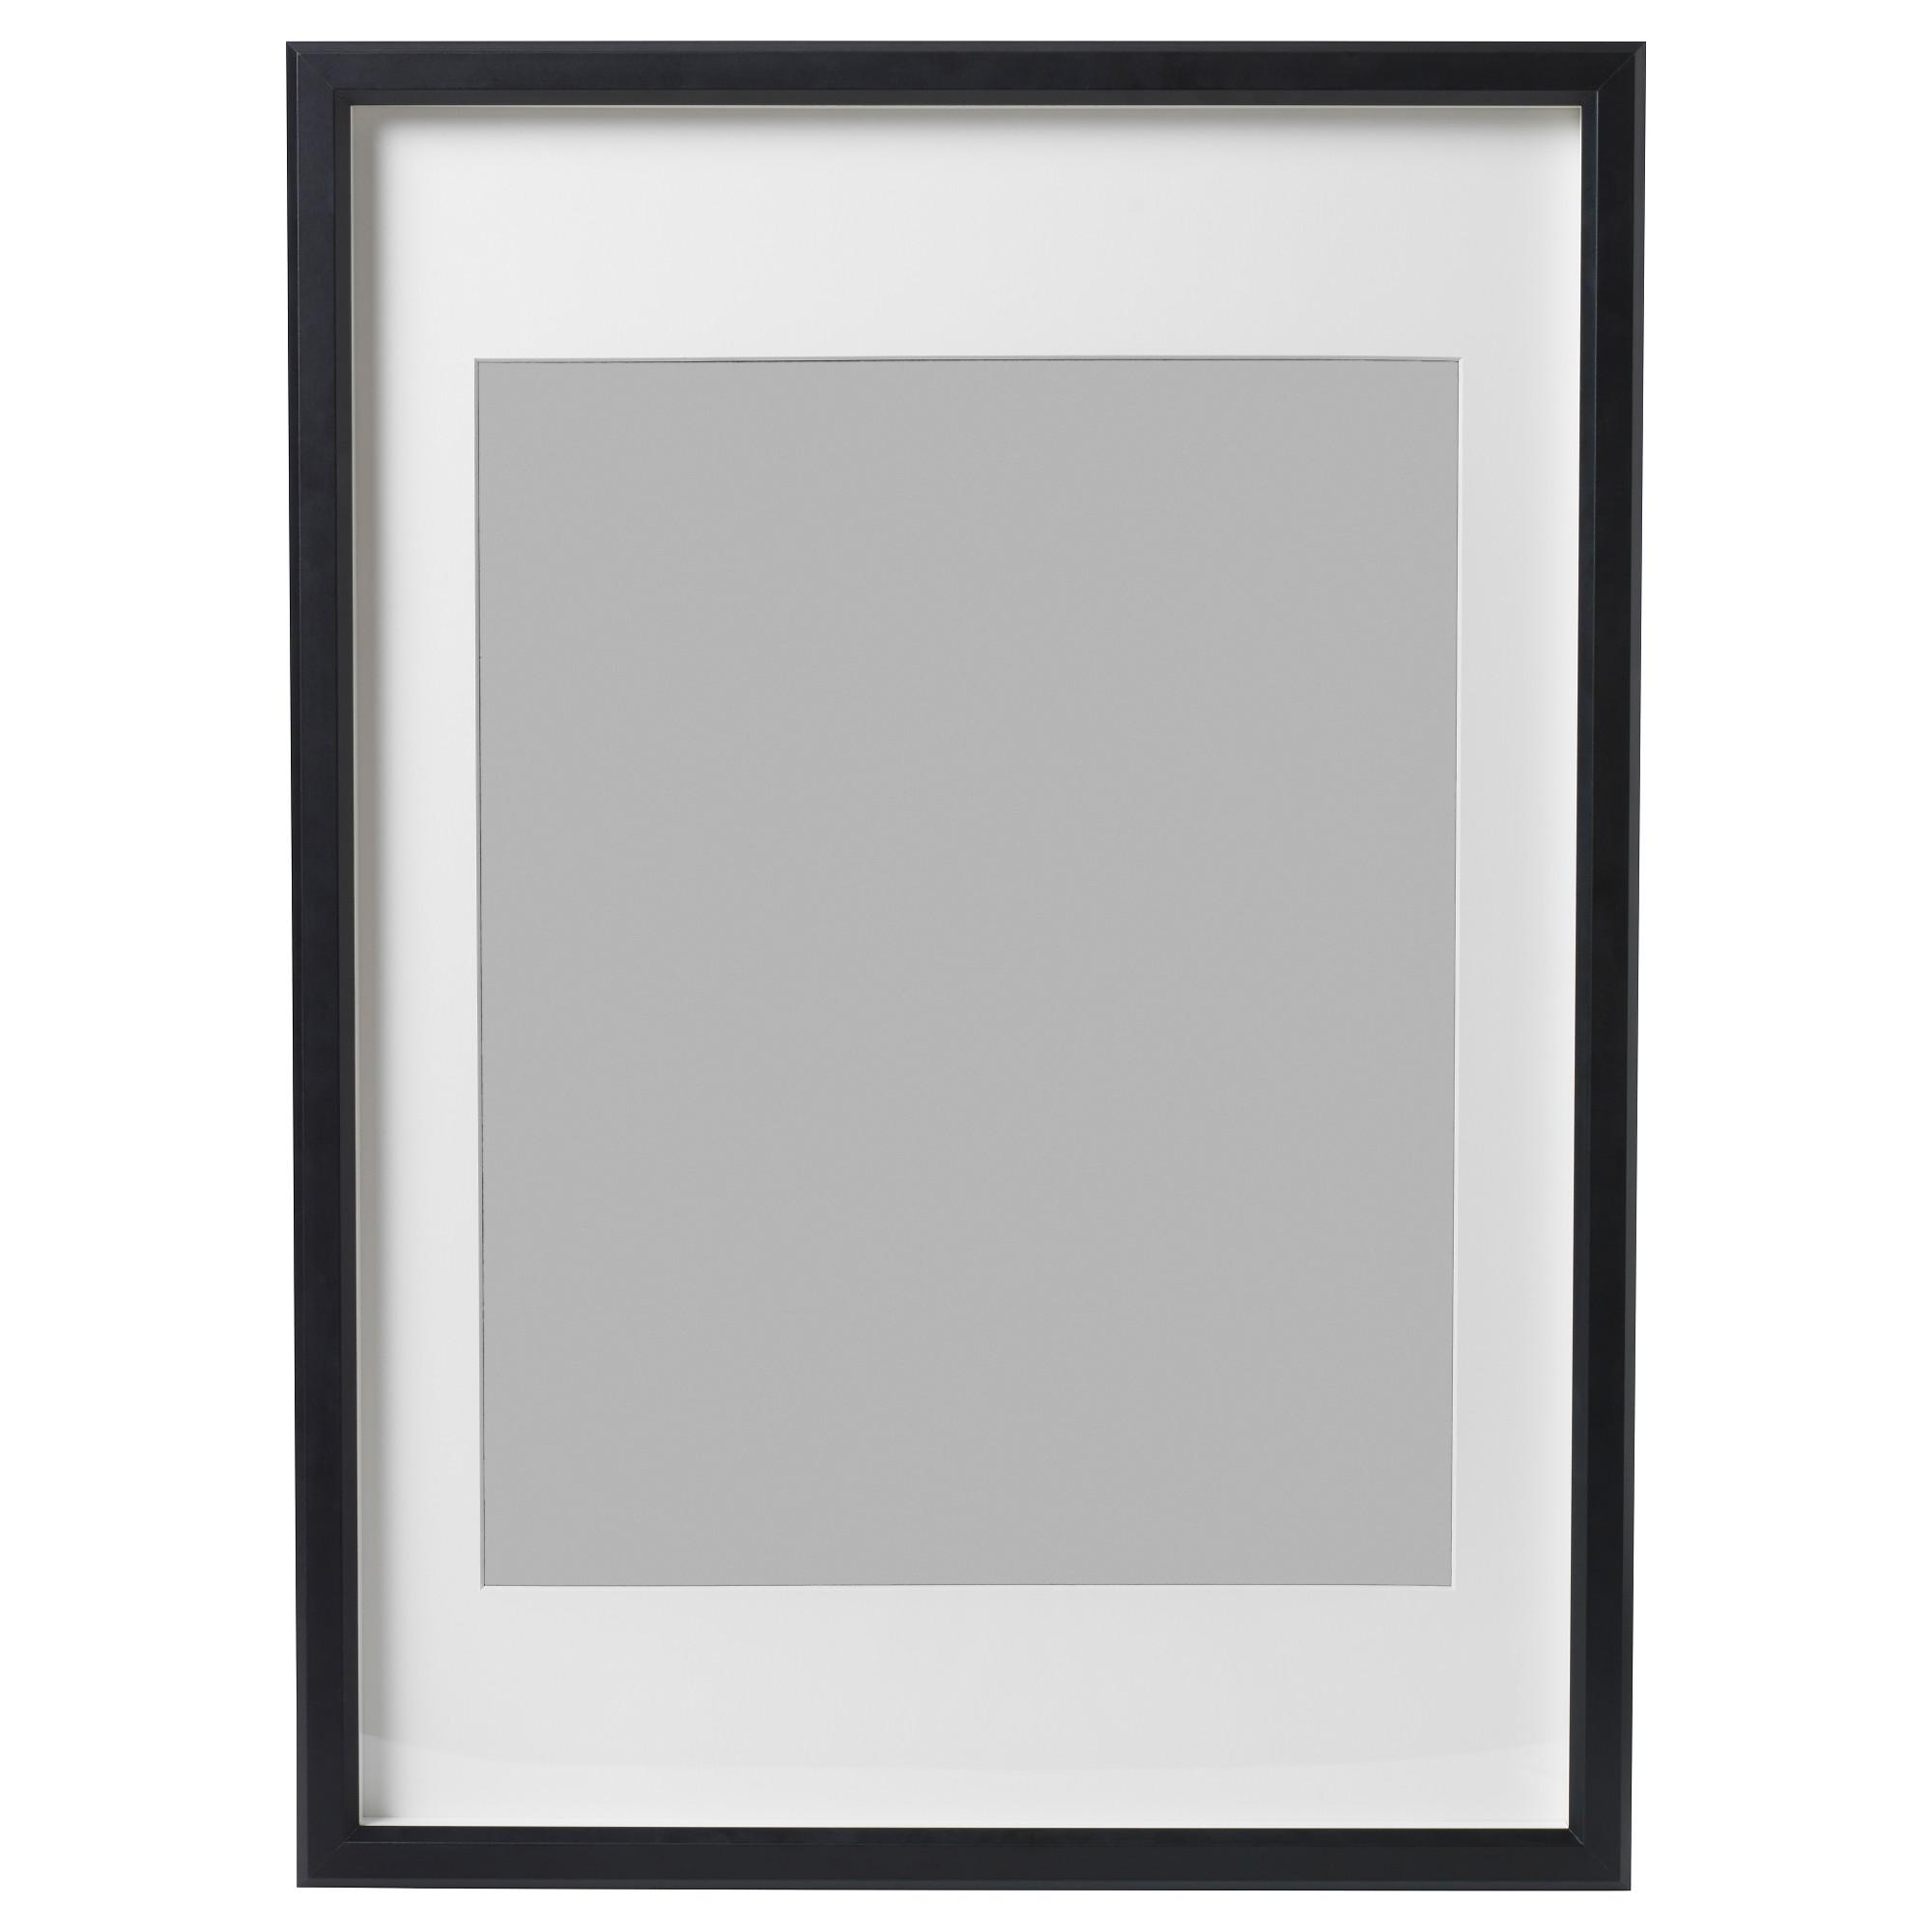 Ikea - Ikea marco de fotos ...